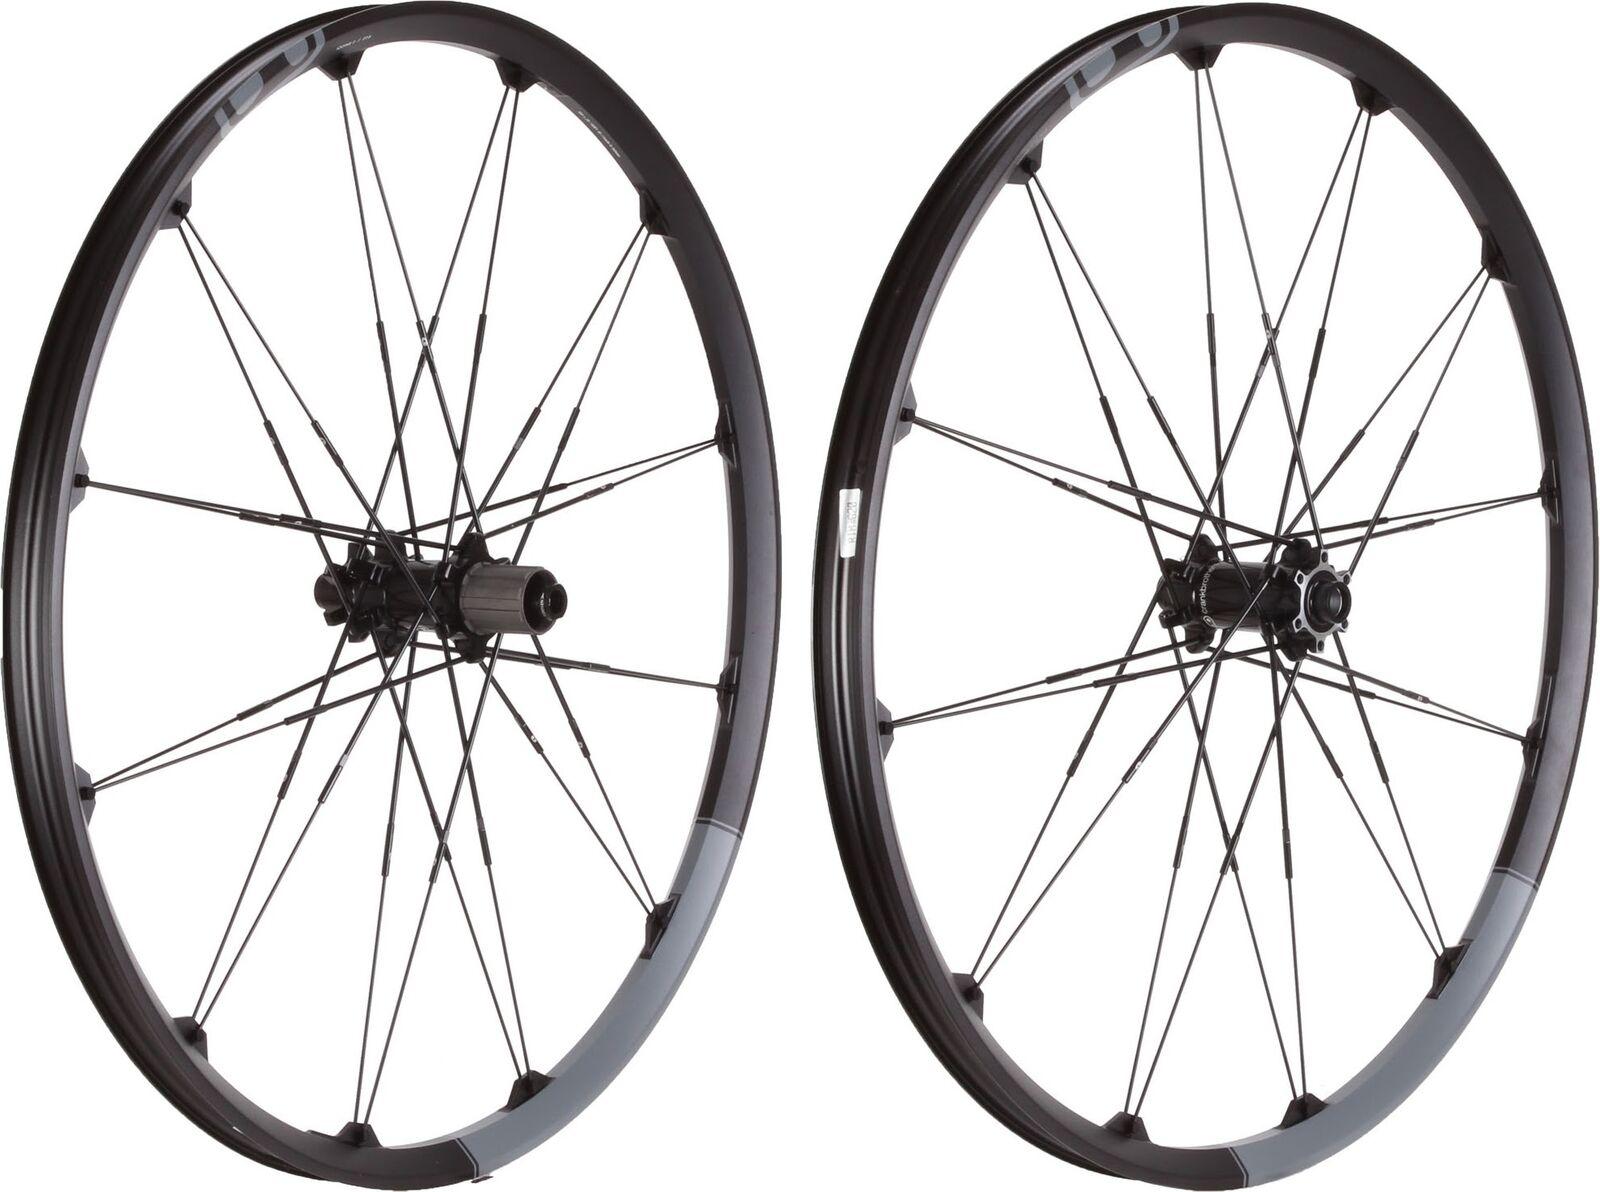 Crank Bredhers Iodine-2 27.5  Wheelset, 15x110 12x148 Boost